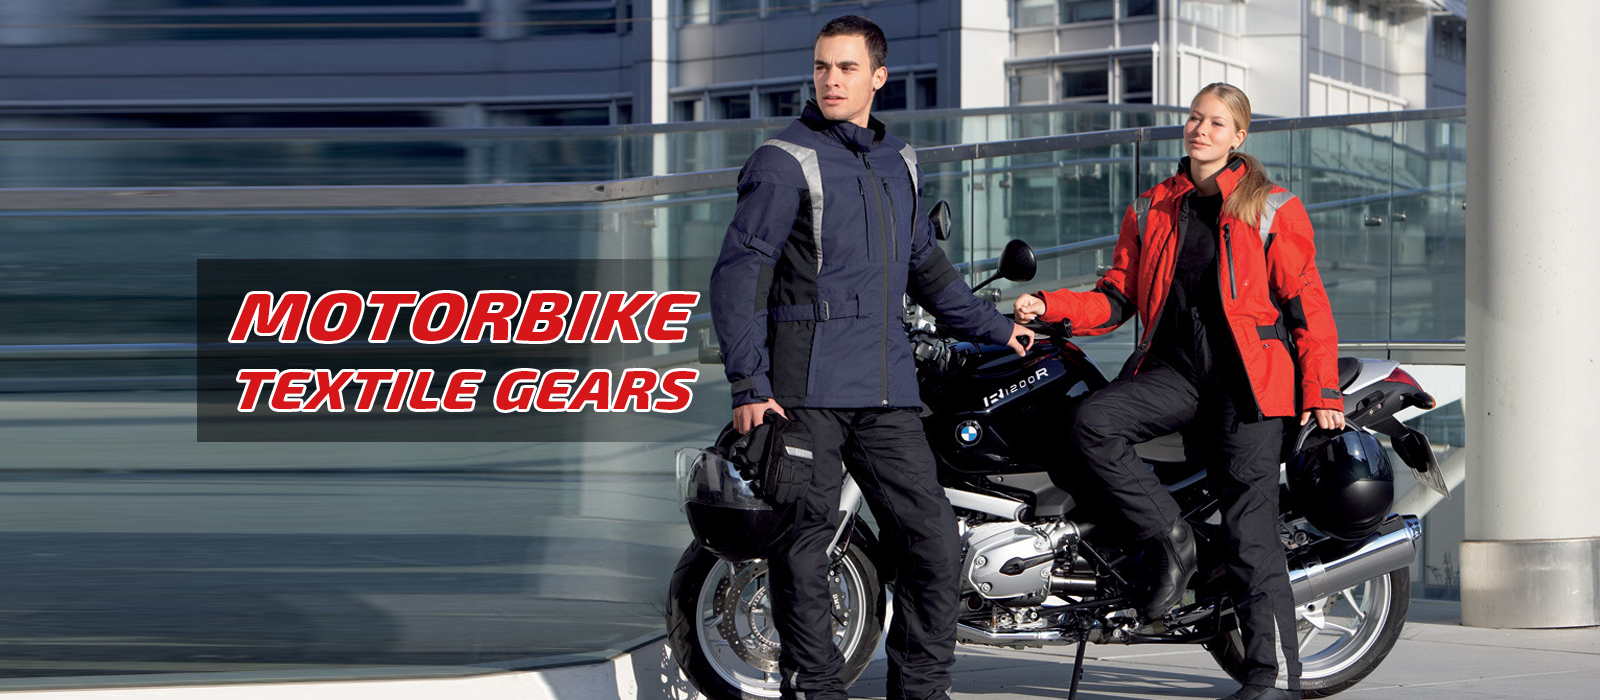 Textile Gears-5